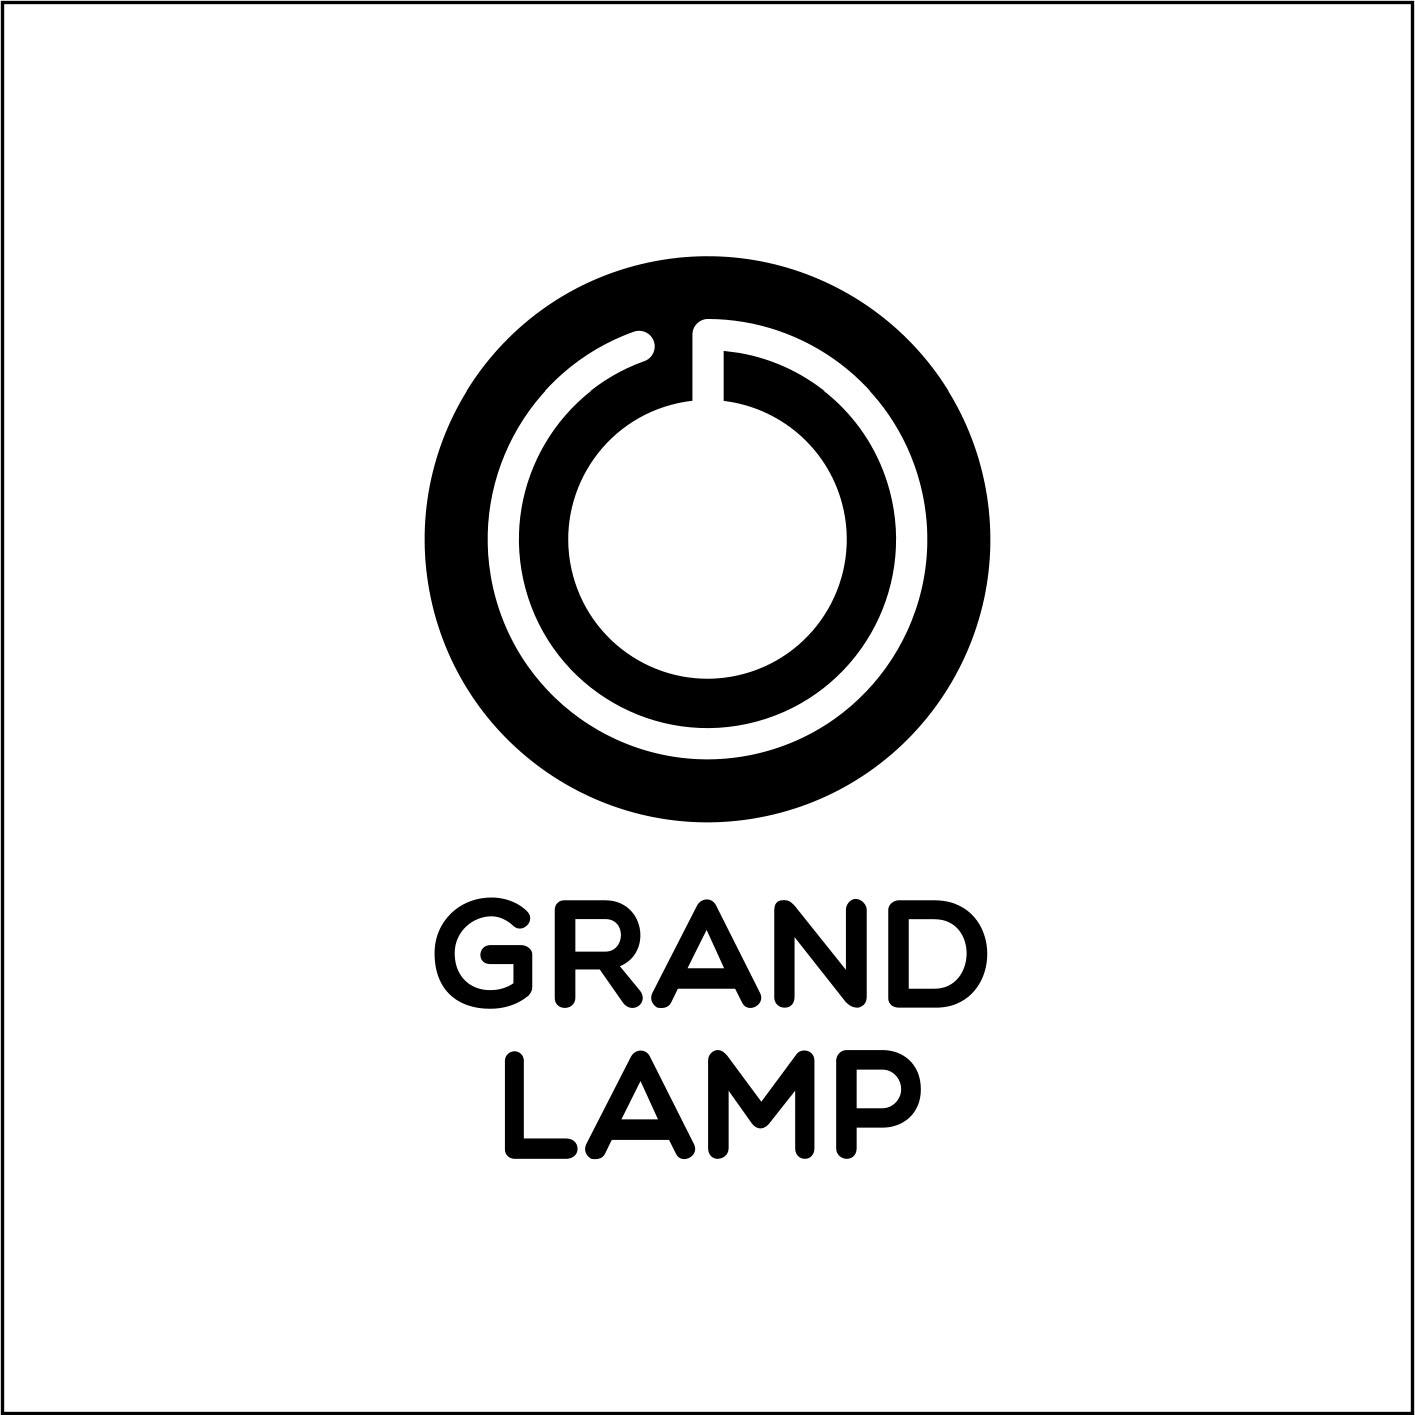 Разработка логотипа и элементов фирменного стиля фото f_30357ead83421b40.jpg